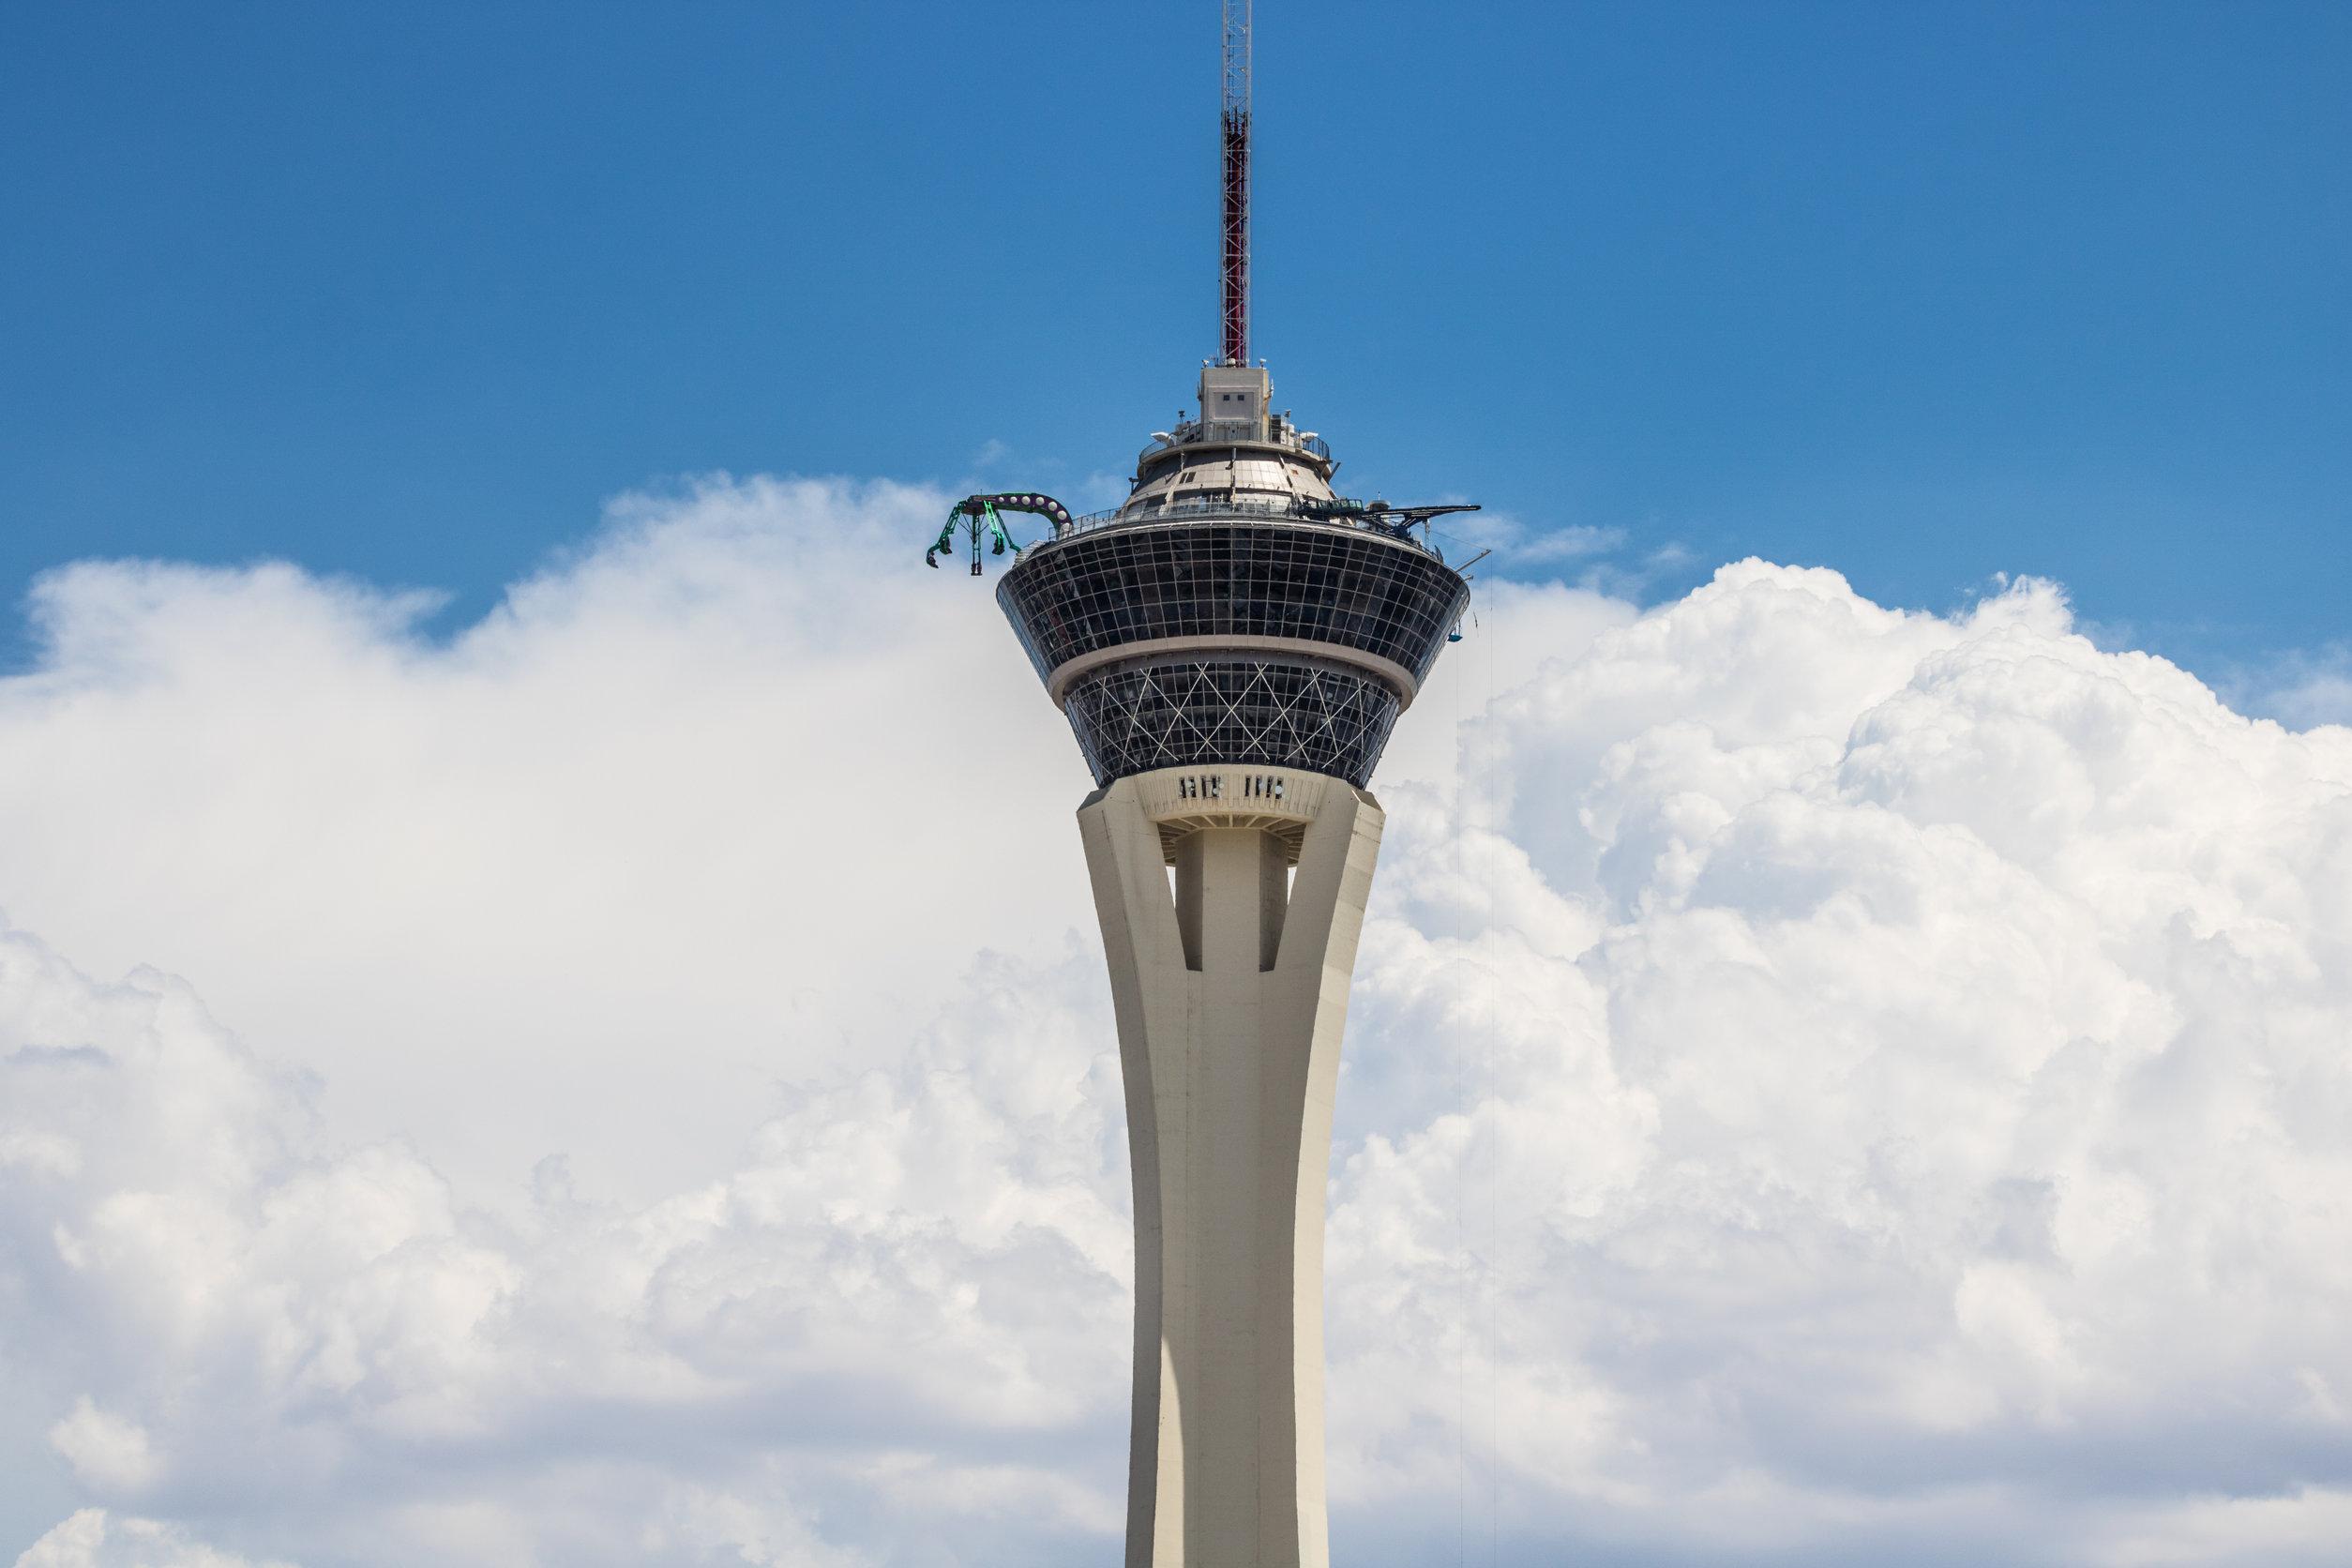 Strat Las Vegas Skypod Exterior